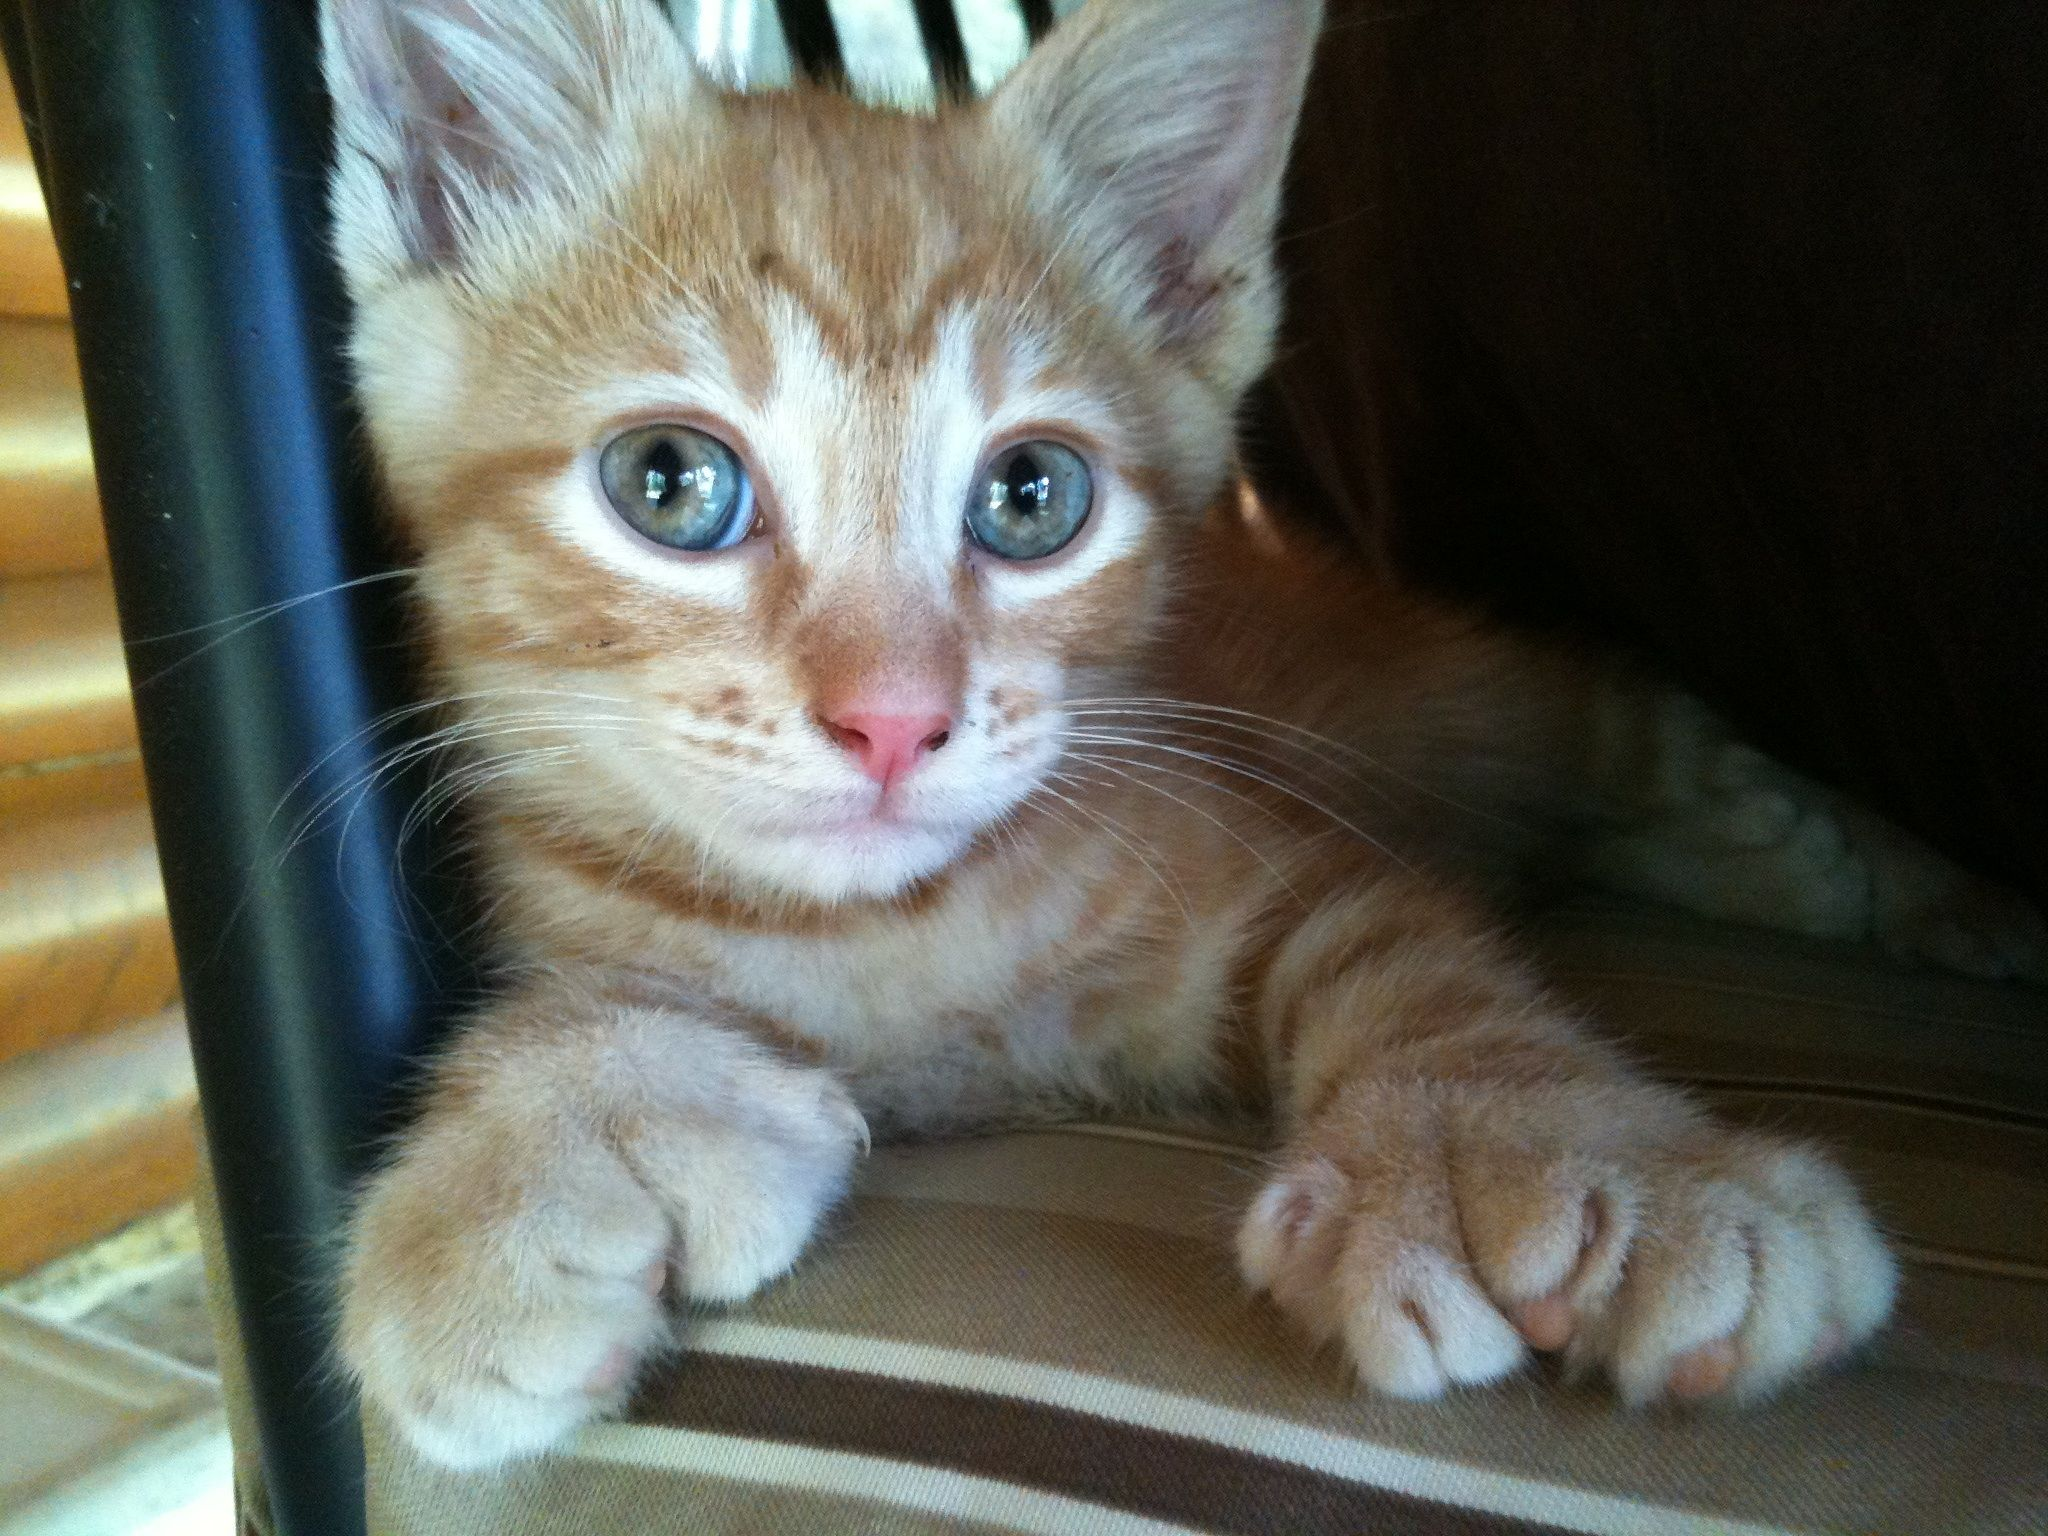 Polydactyl ;-) | Polydactyl Cats | Cats, Polydactyl cat ...  Polydactyl ;-) ...